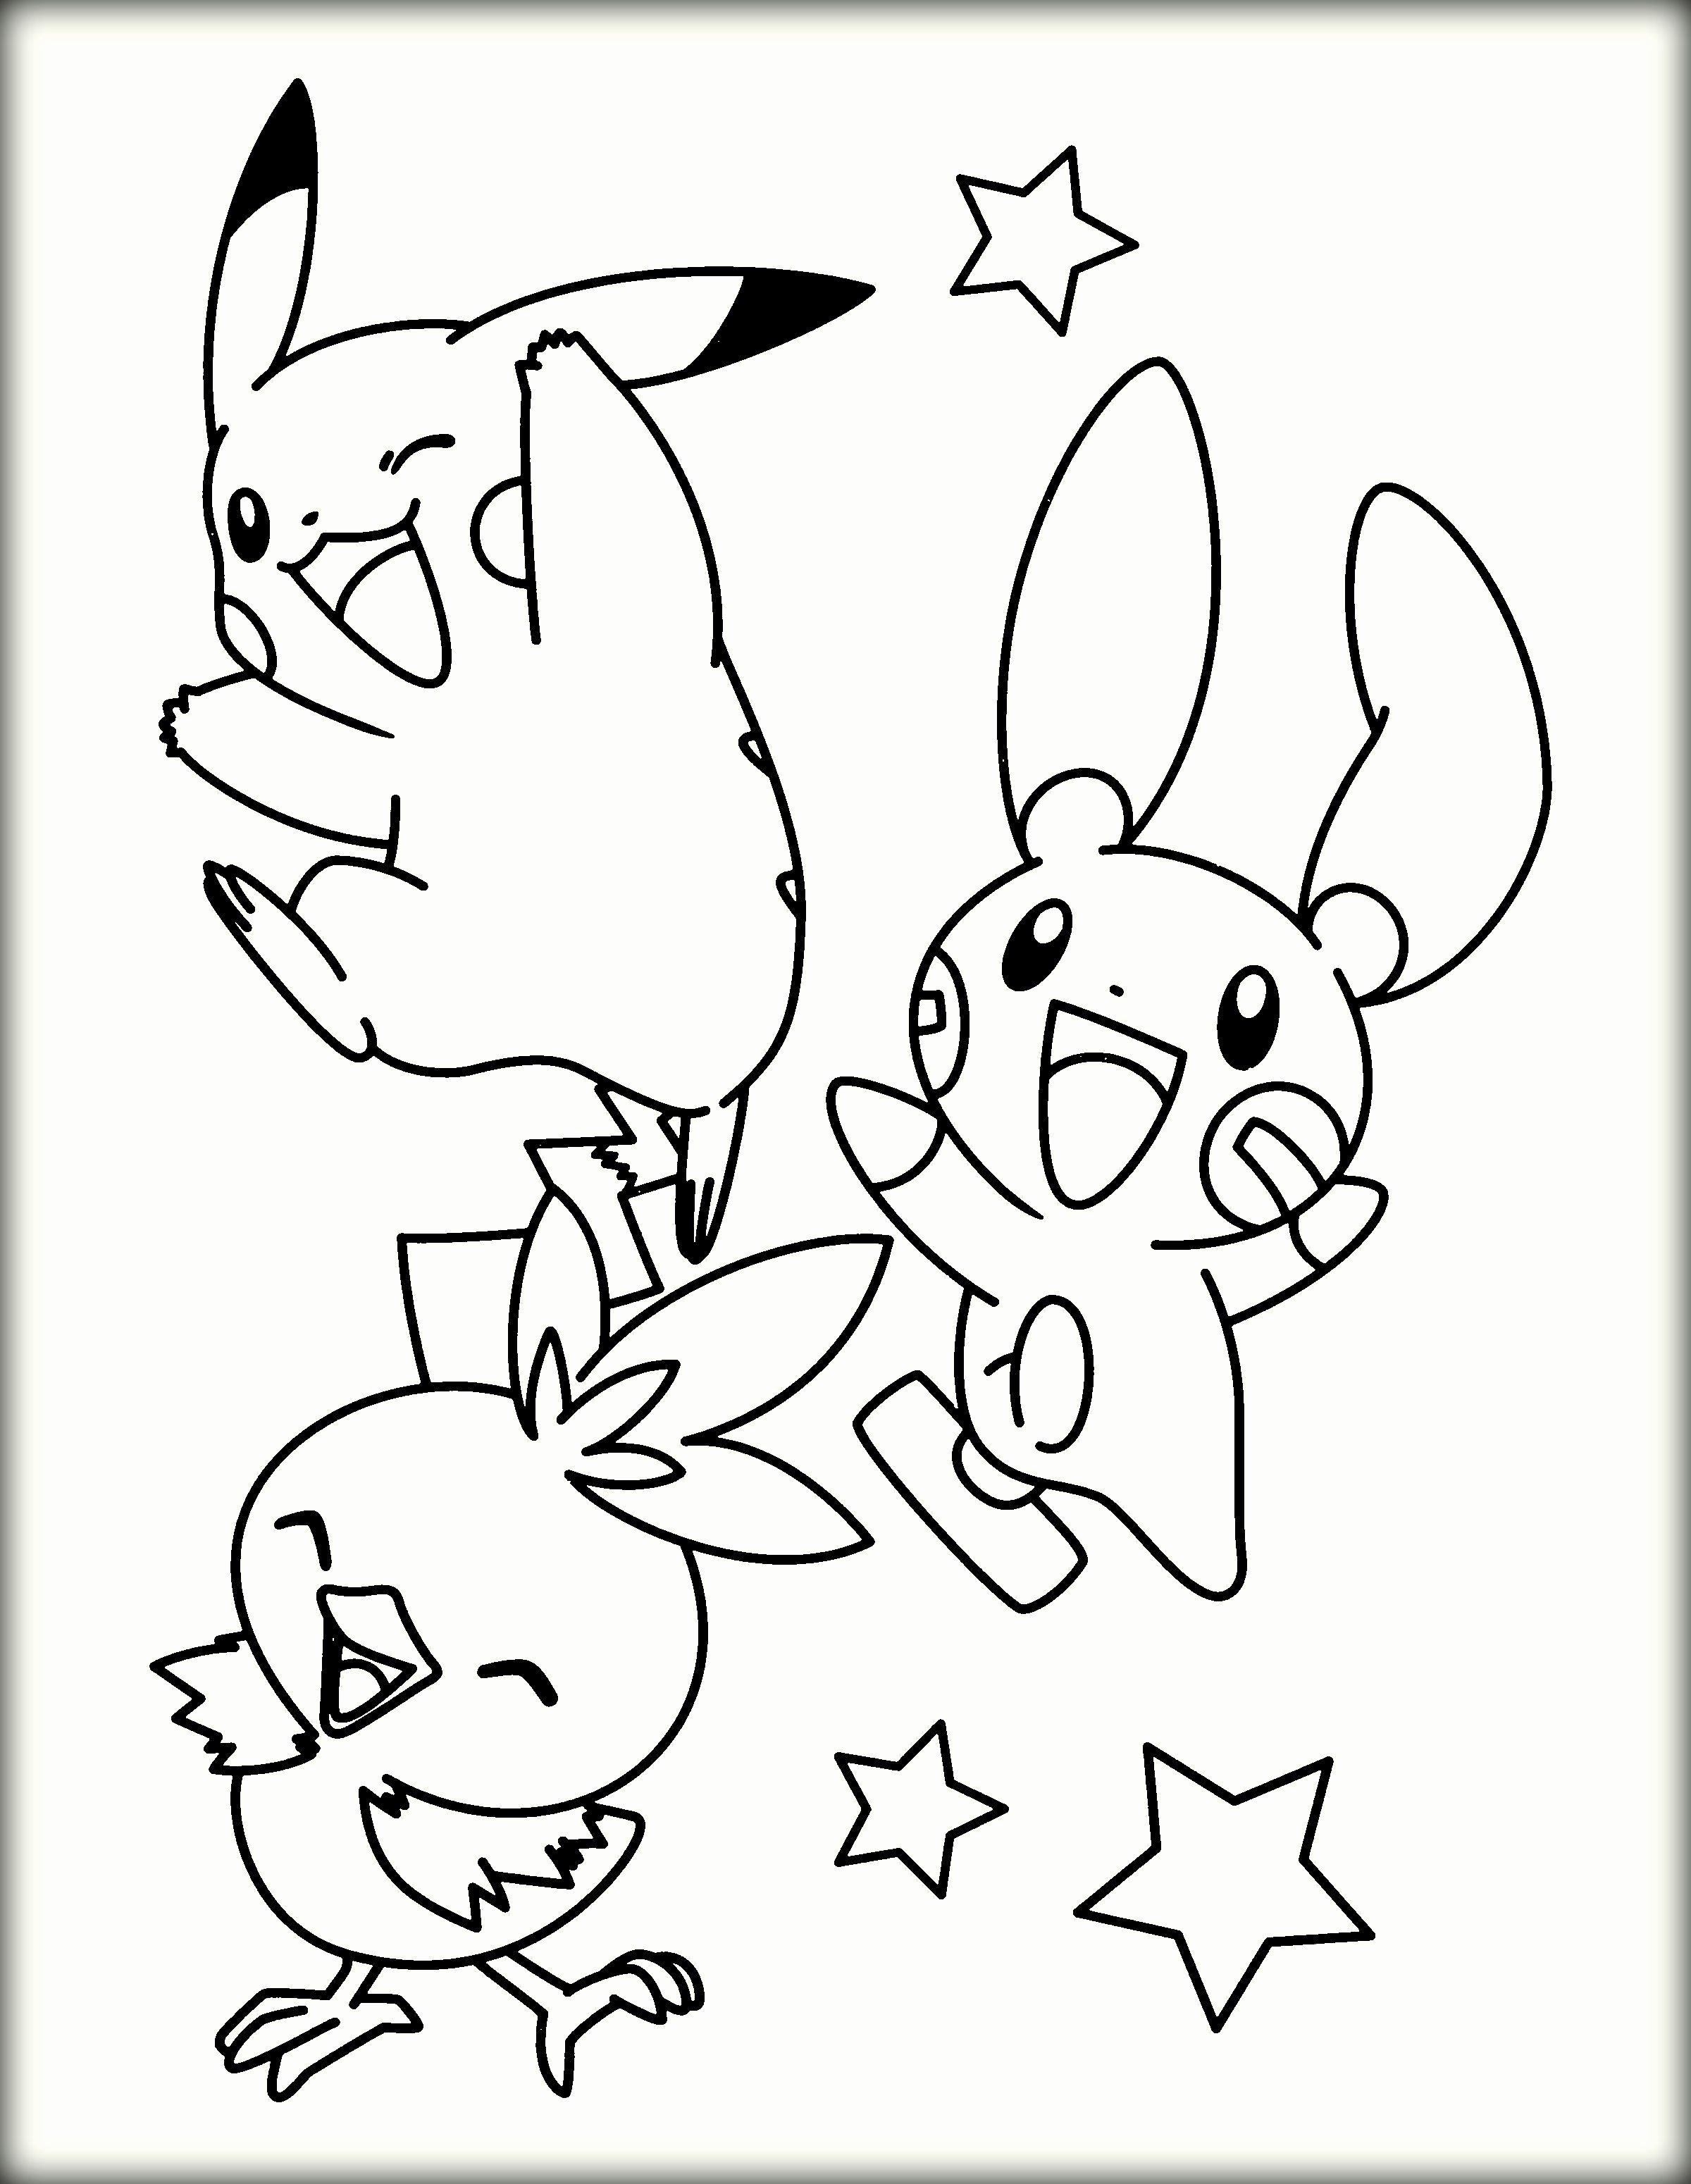 Free Printable Pokemon Pictures Inspirational 38 Pokemon Coloring Pages Free Printable Pokemon Coloring